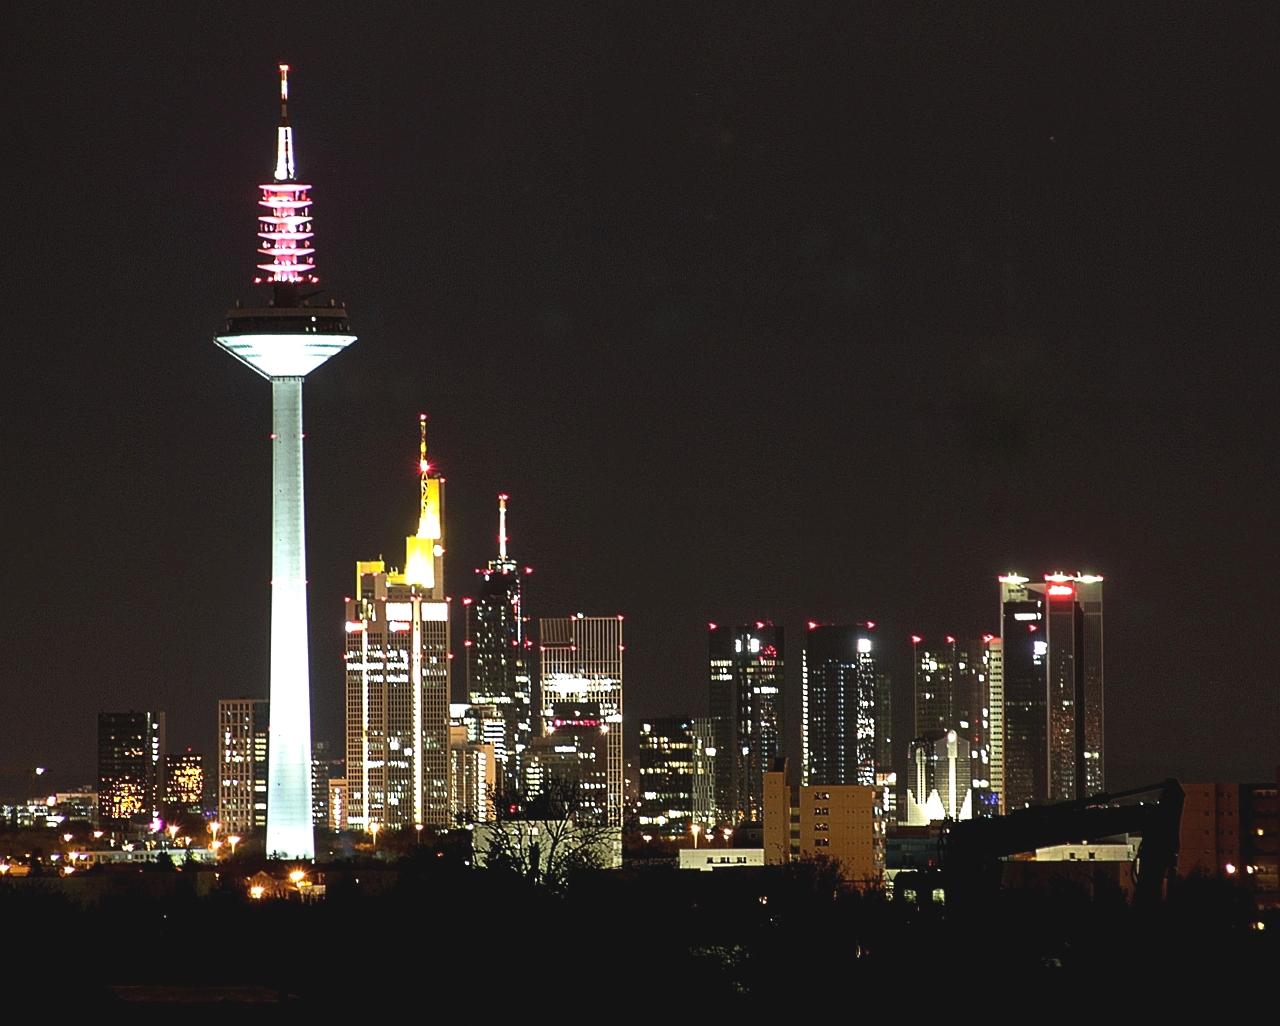 Frankfurt skyline at night (detail)